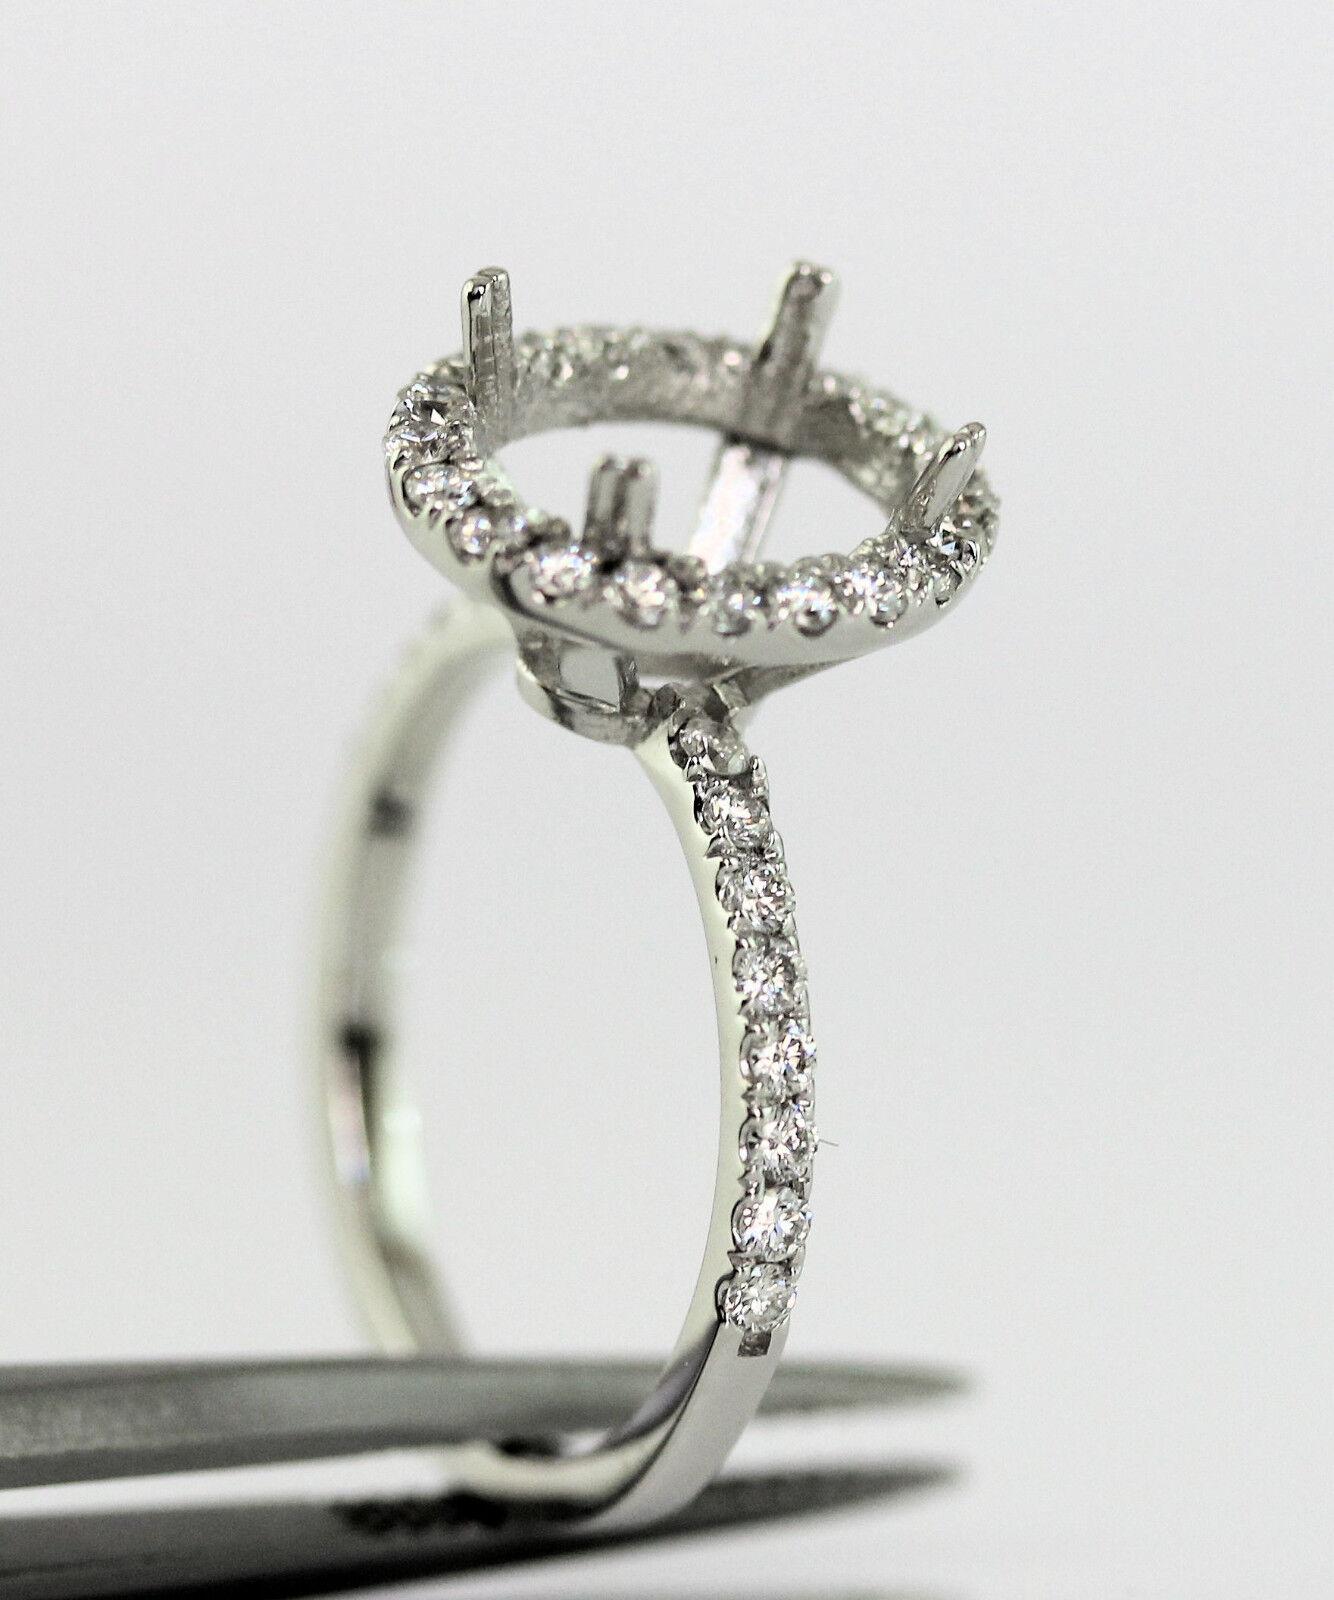 10x8 Oval 0.50 Carat Diamond Semi Mount Engagmant Ring in 14k White gold